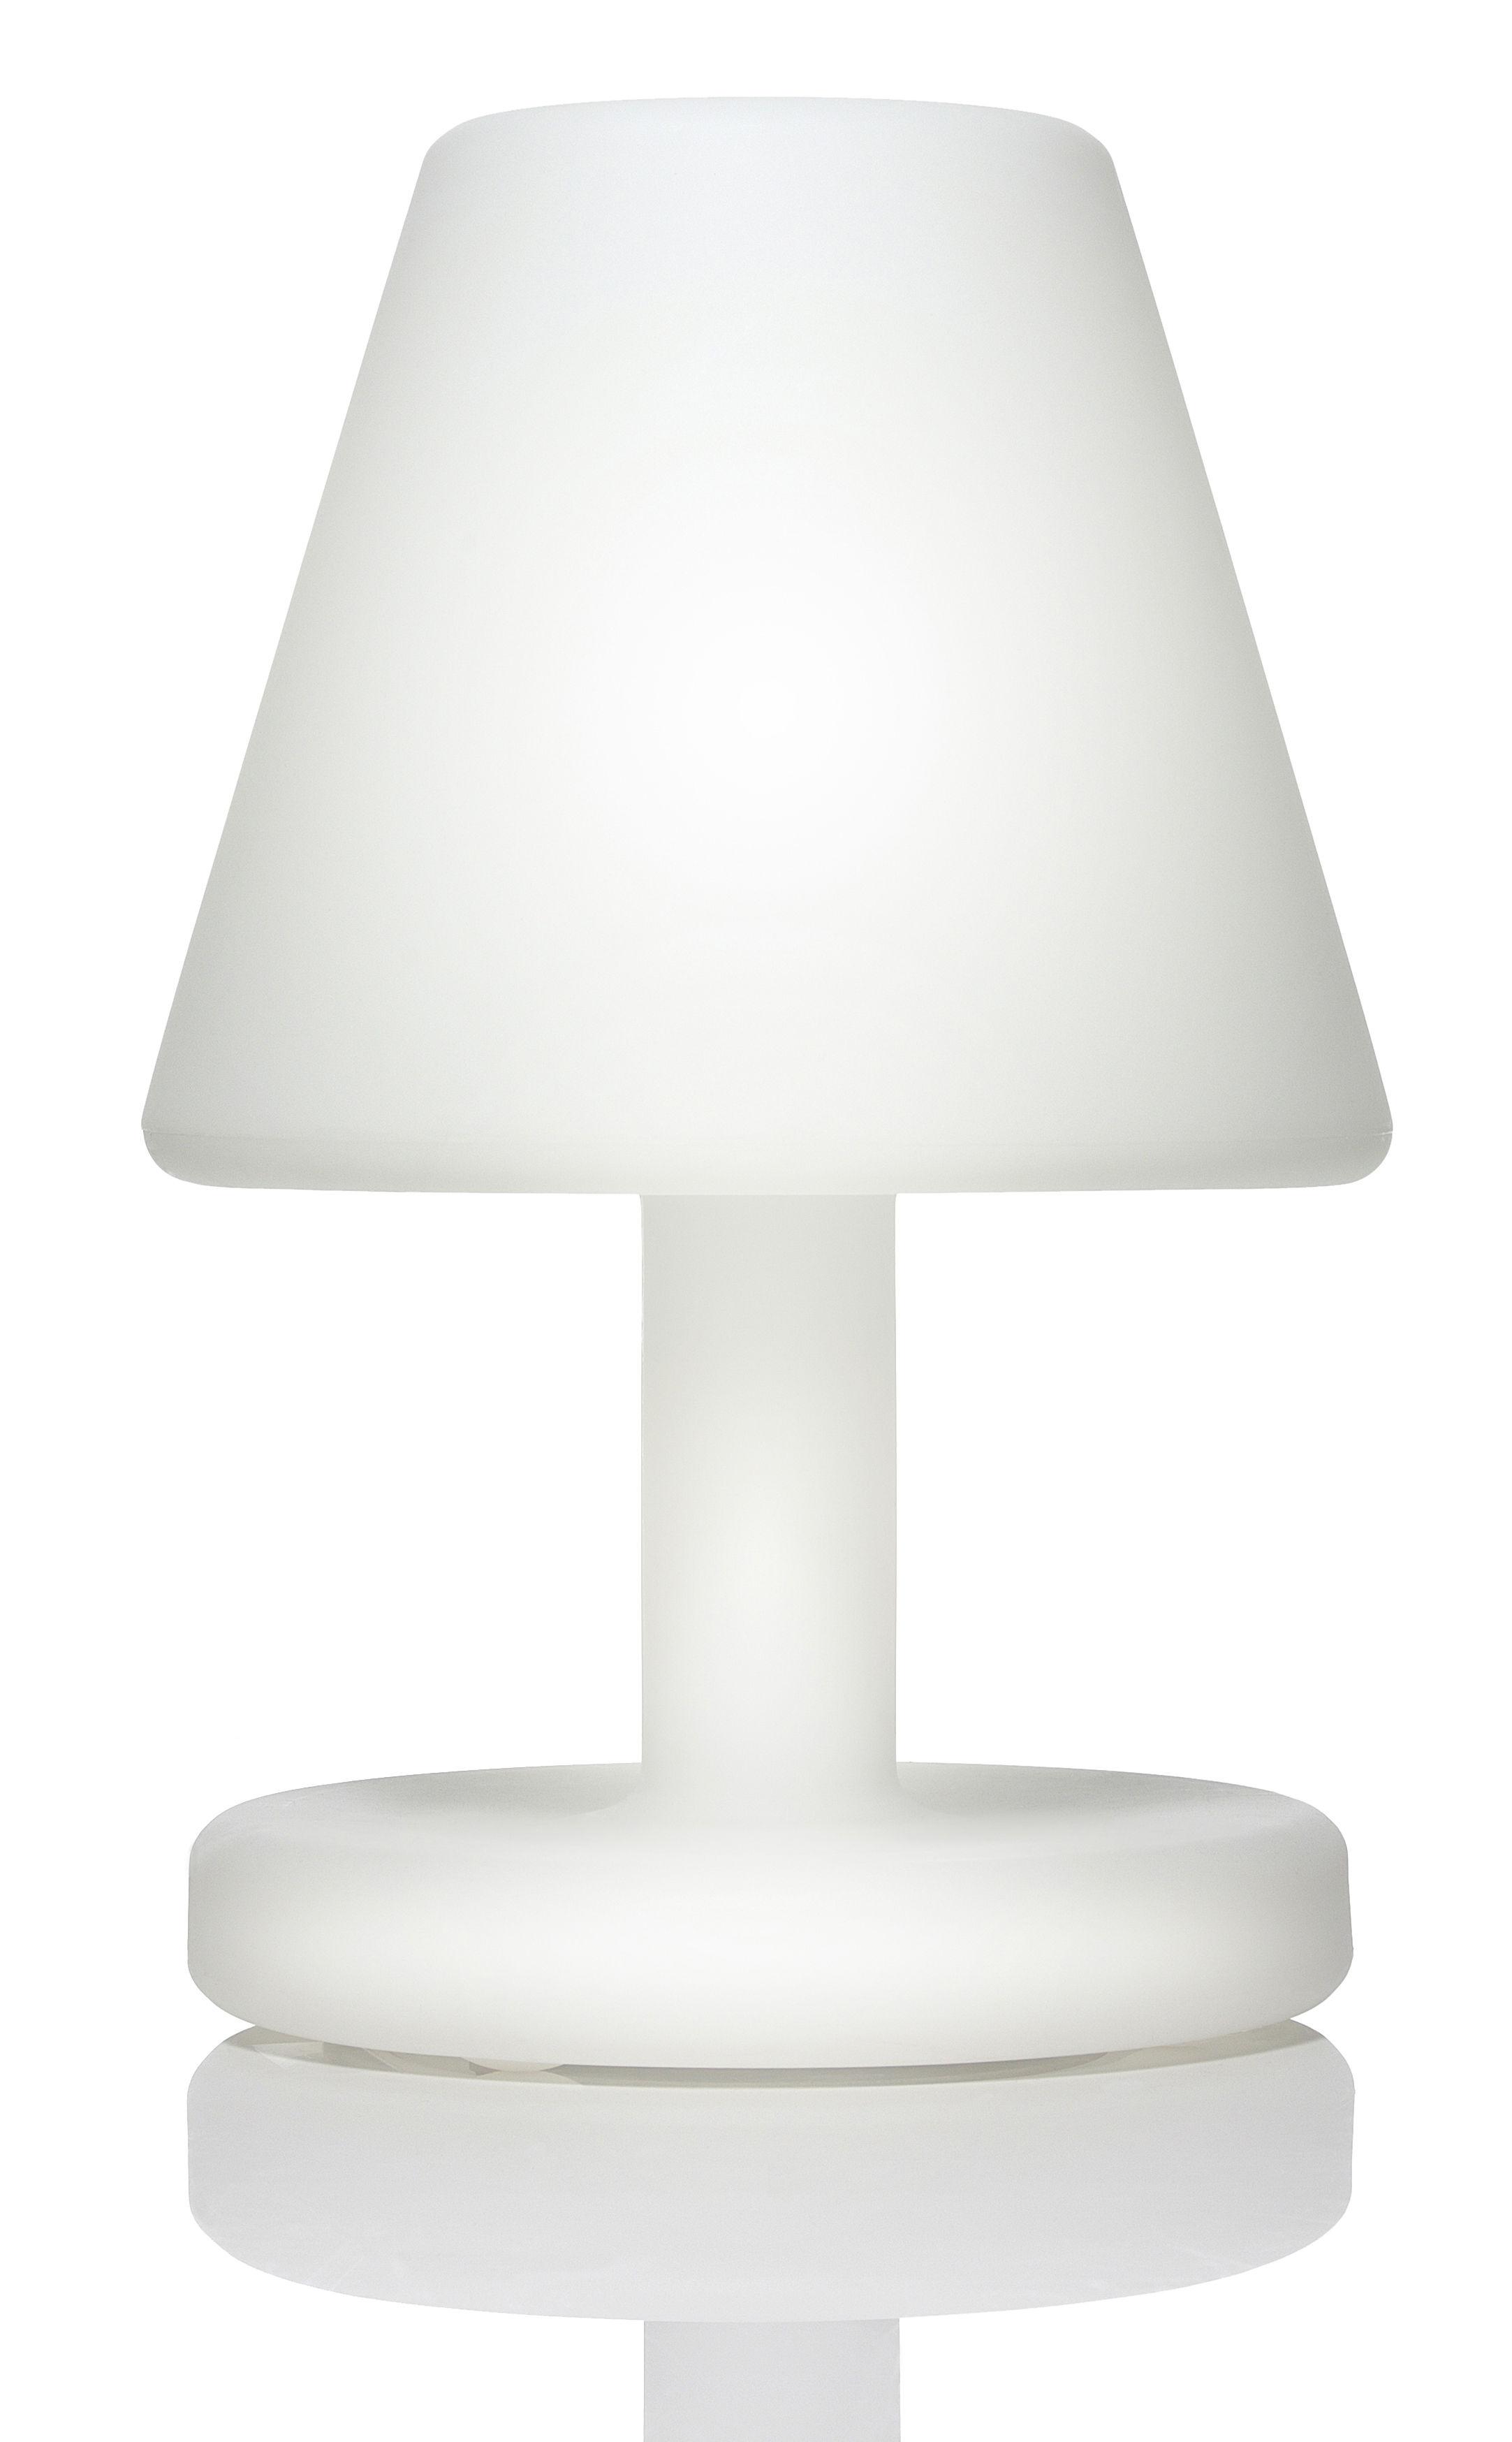 Lampe De Sol Edison The Grand H 90 Cm Fluo Blanc Fatboy Made